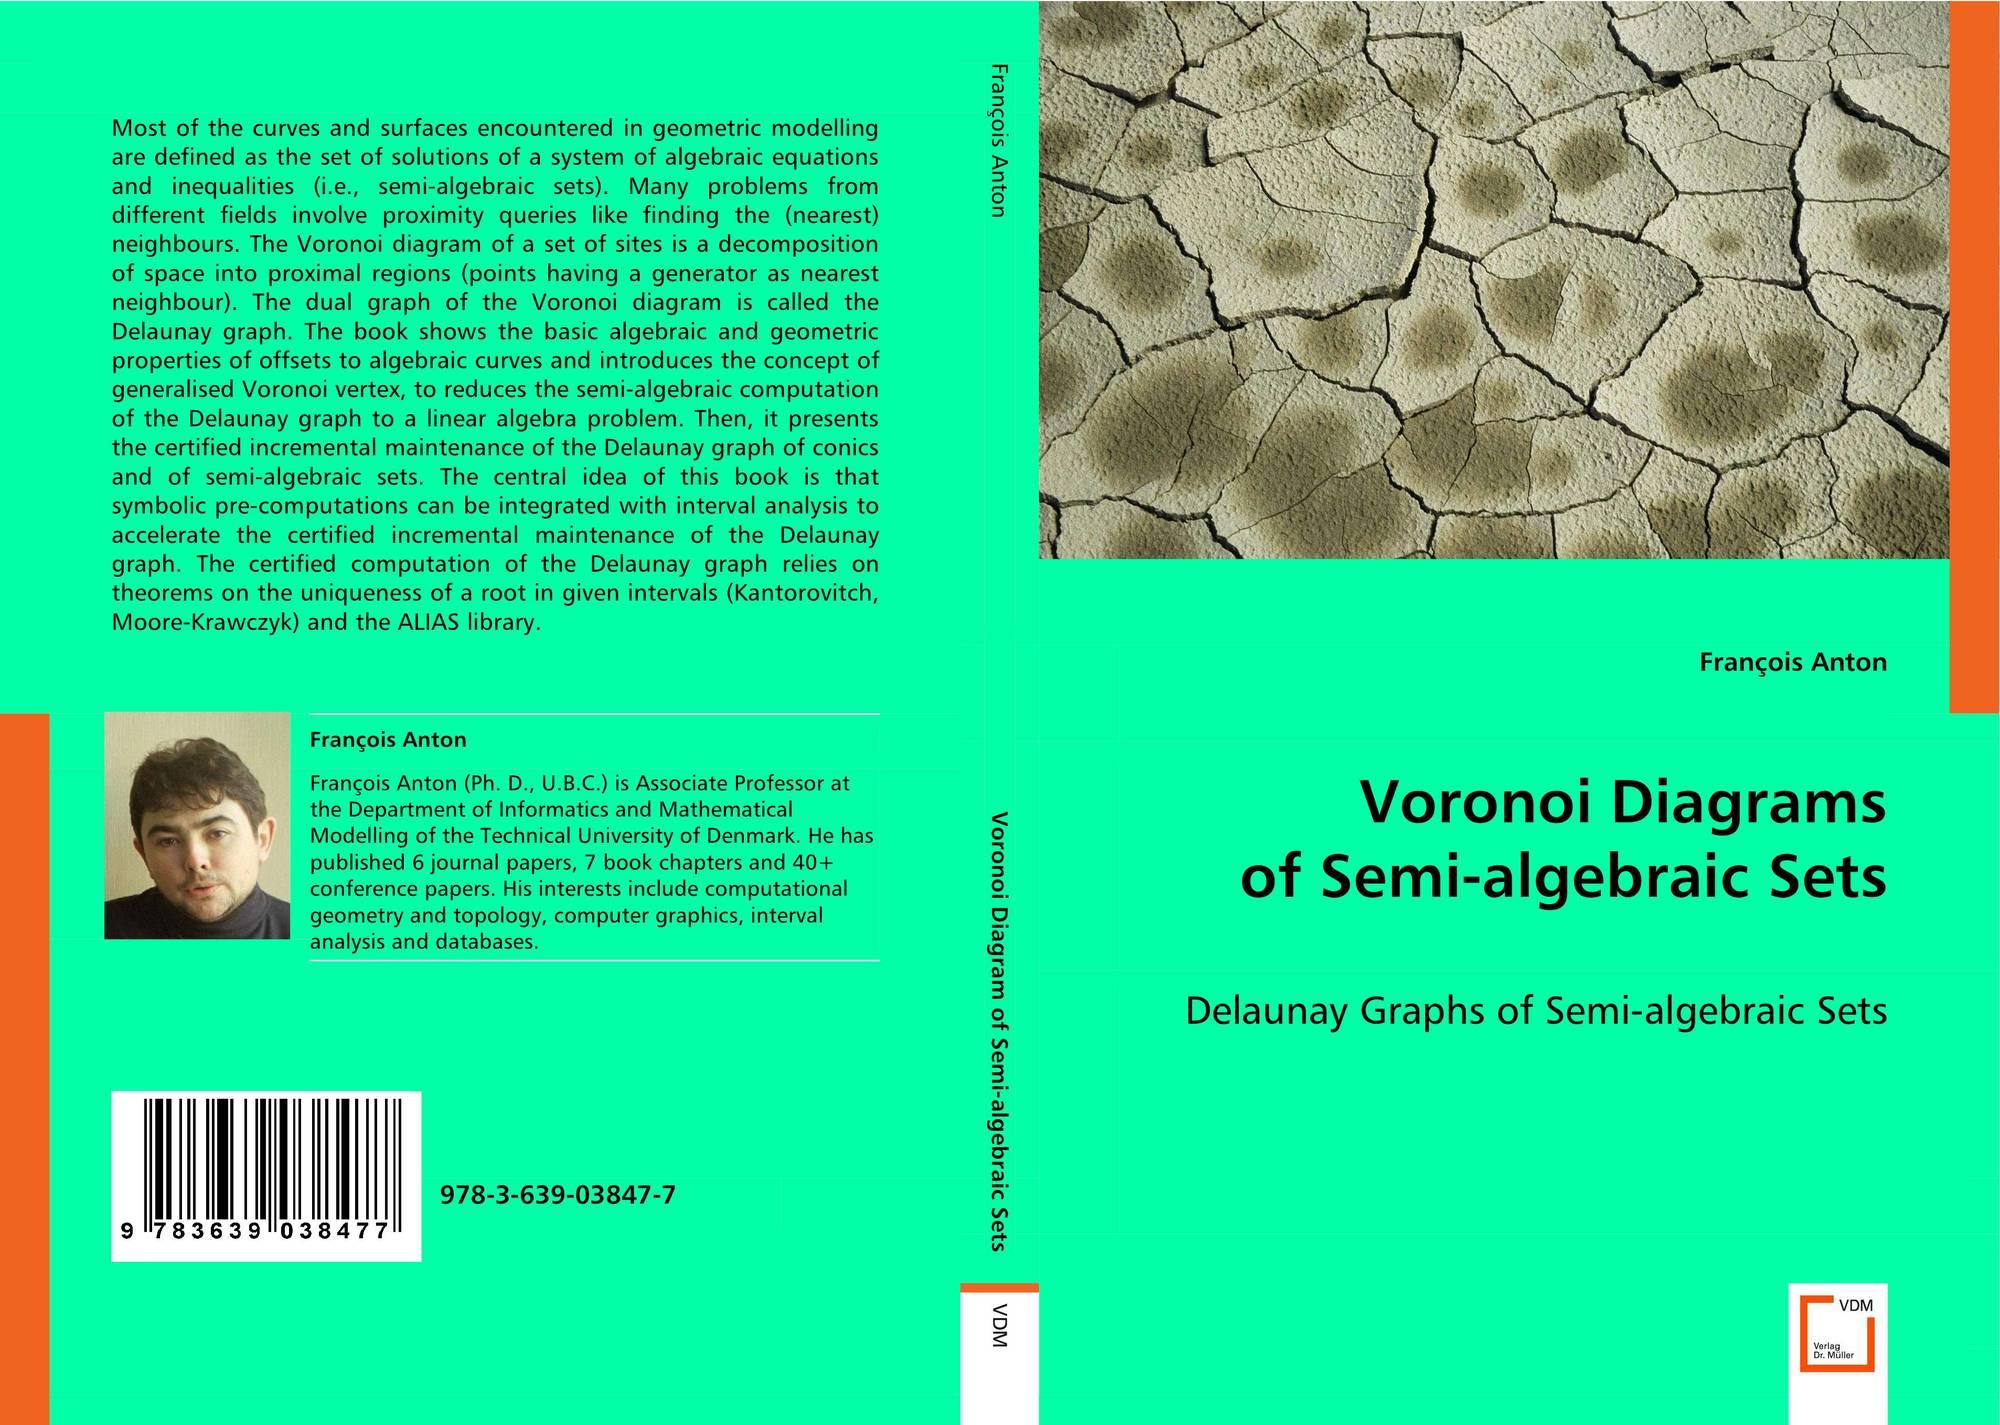 Voronoi Diagrams Of Semi Algebraic Sets 978 3 639 03847 7 Diagram And Offset Curves 9783639038477